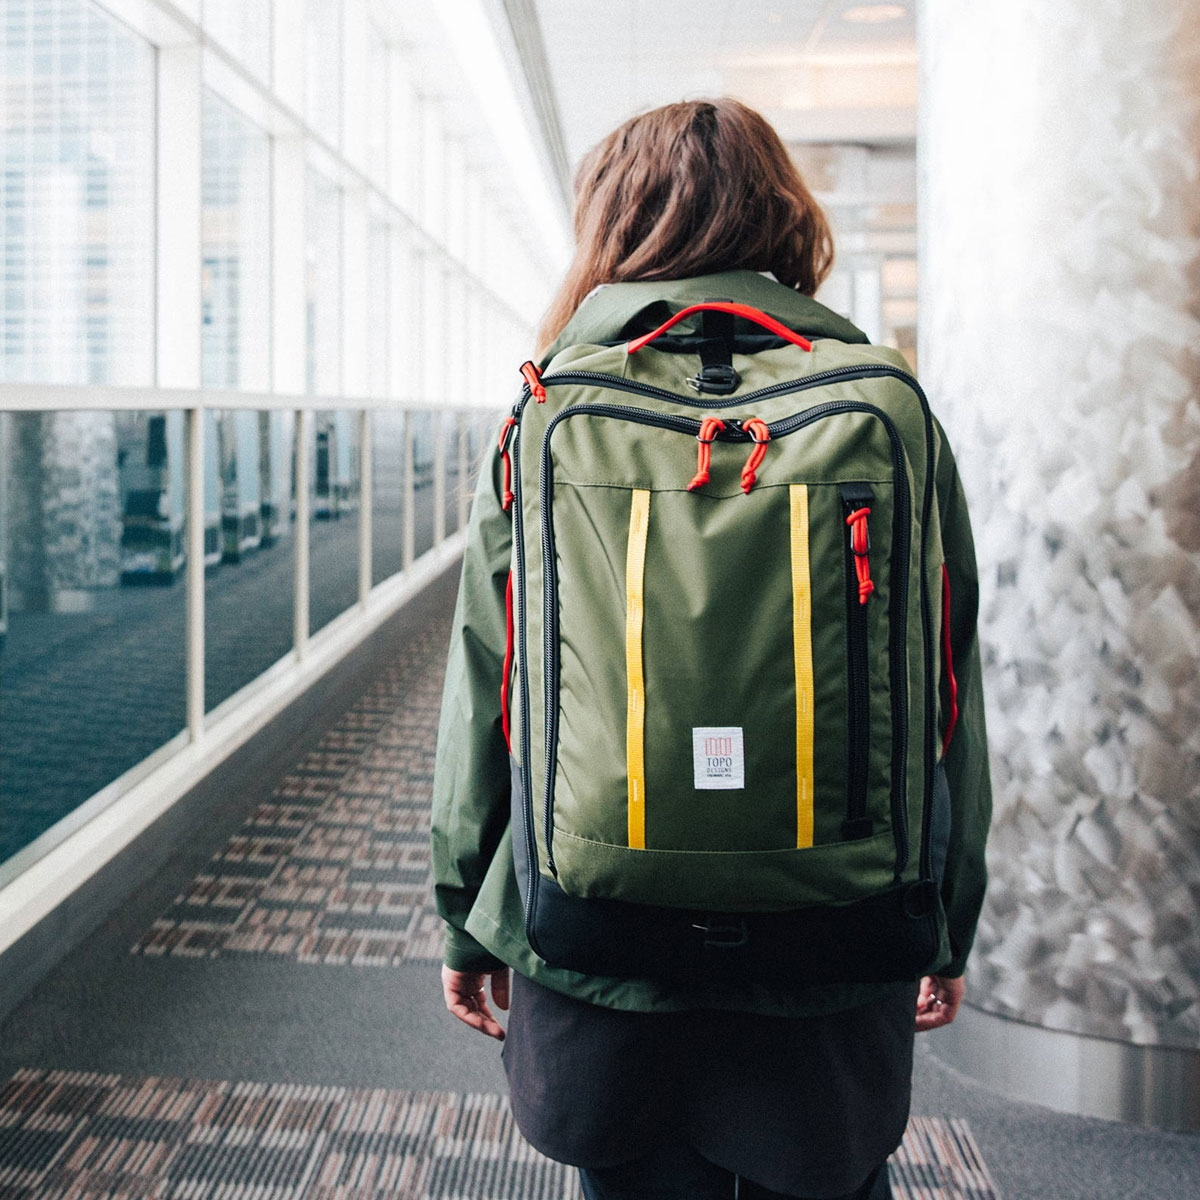 Topo Designs Travel Bag, the most versatile travel bag